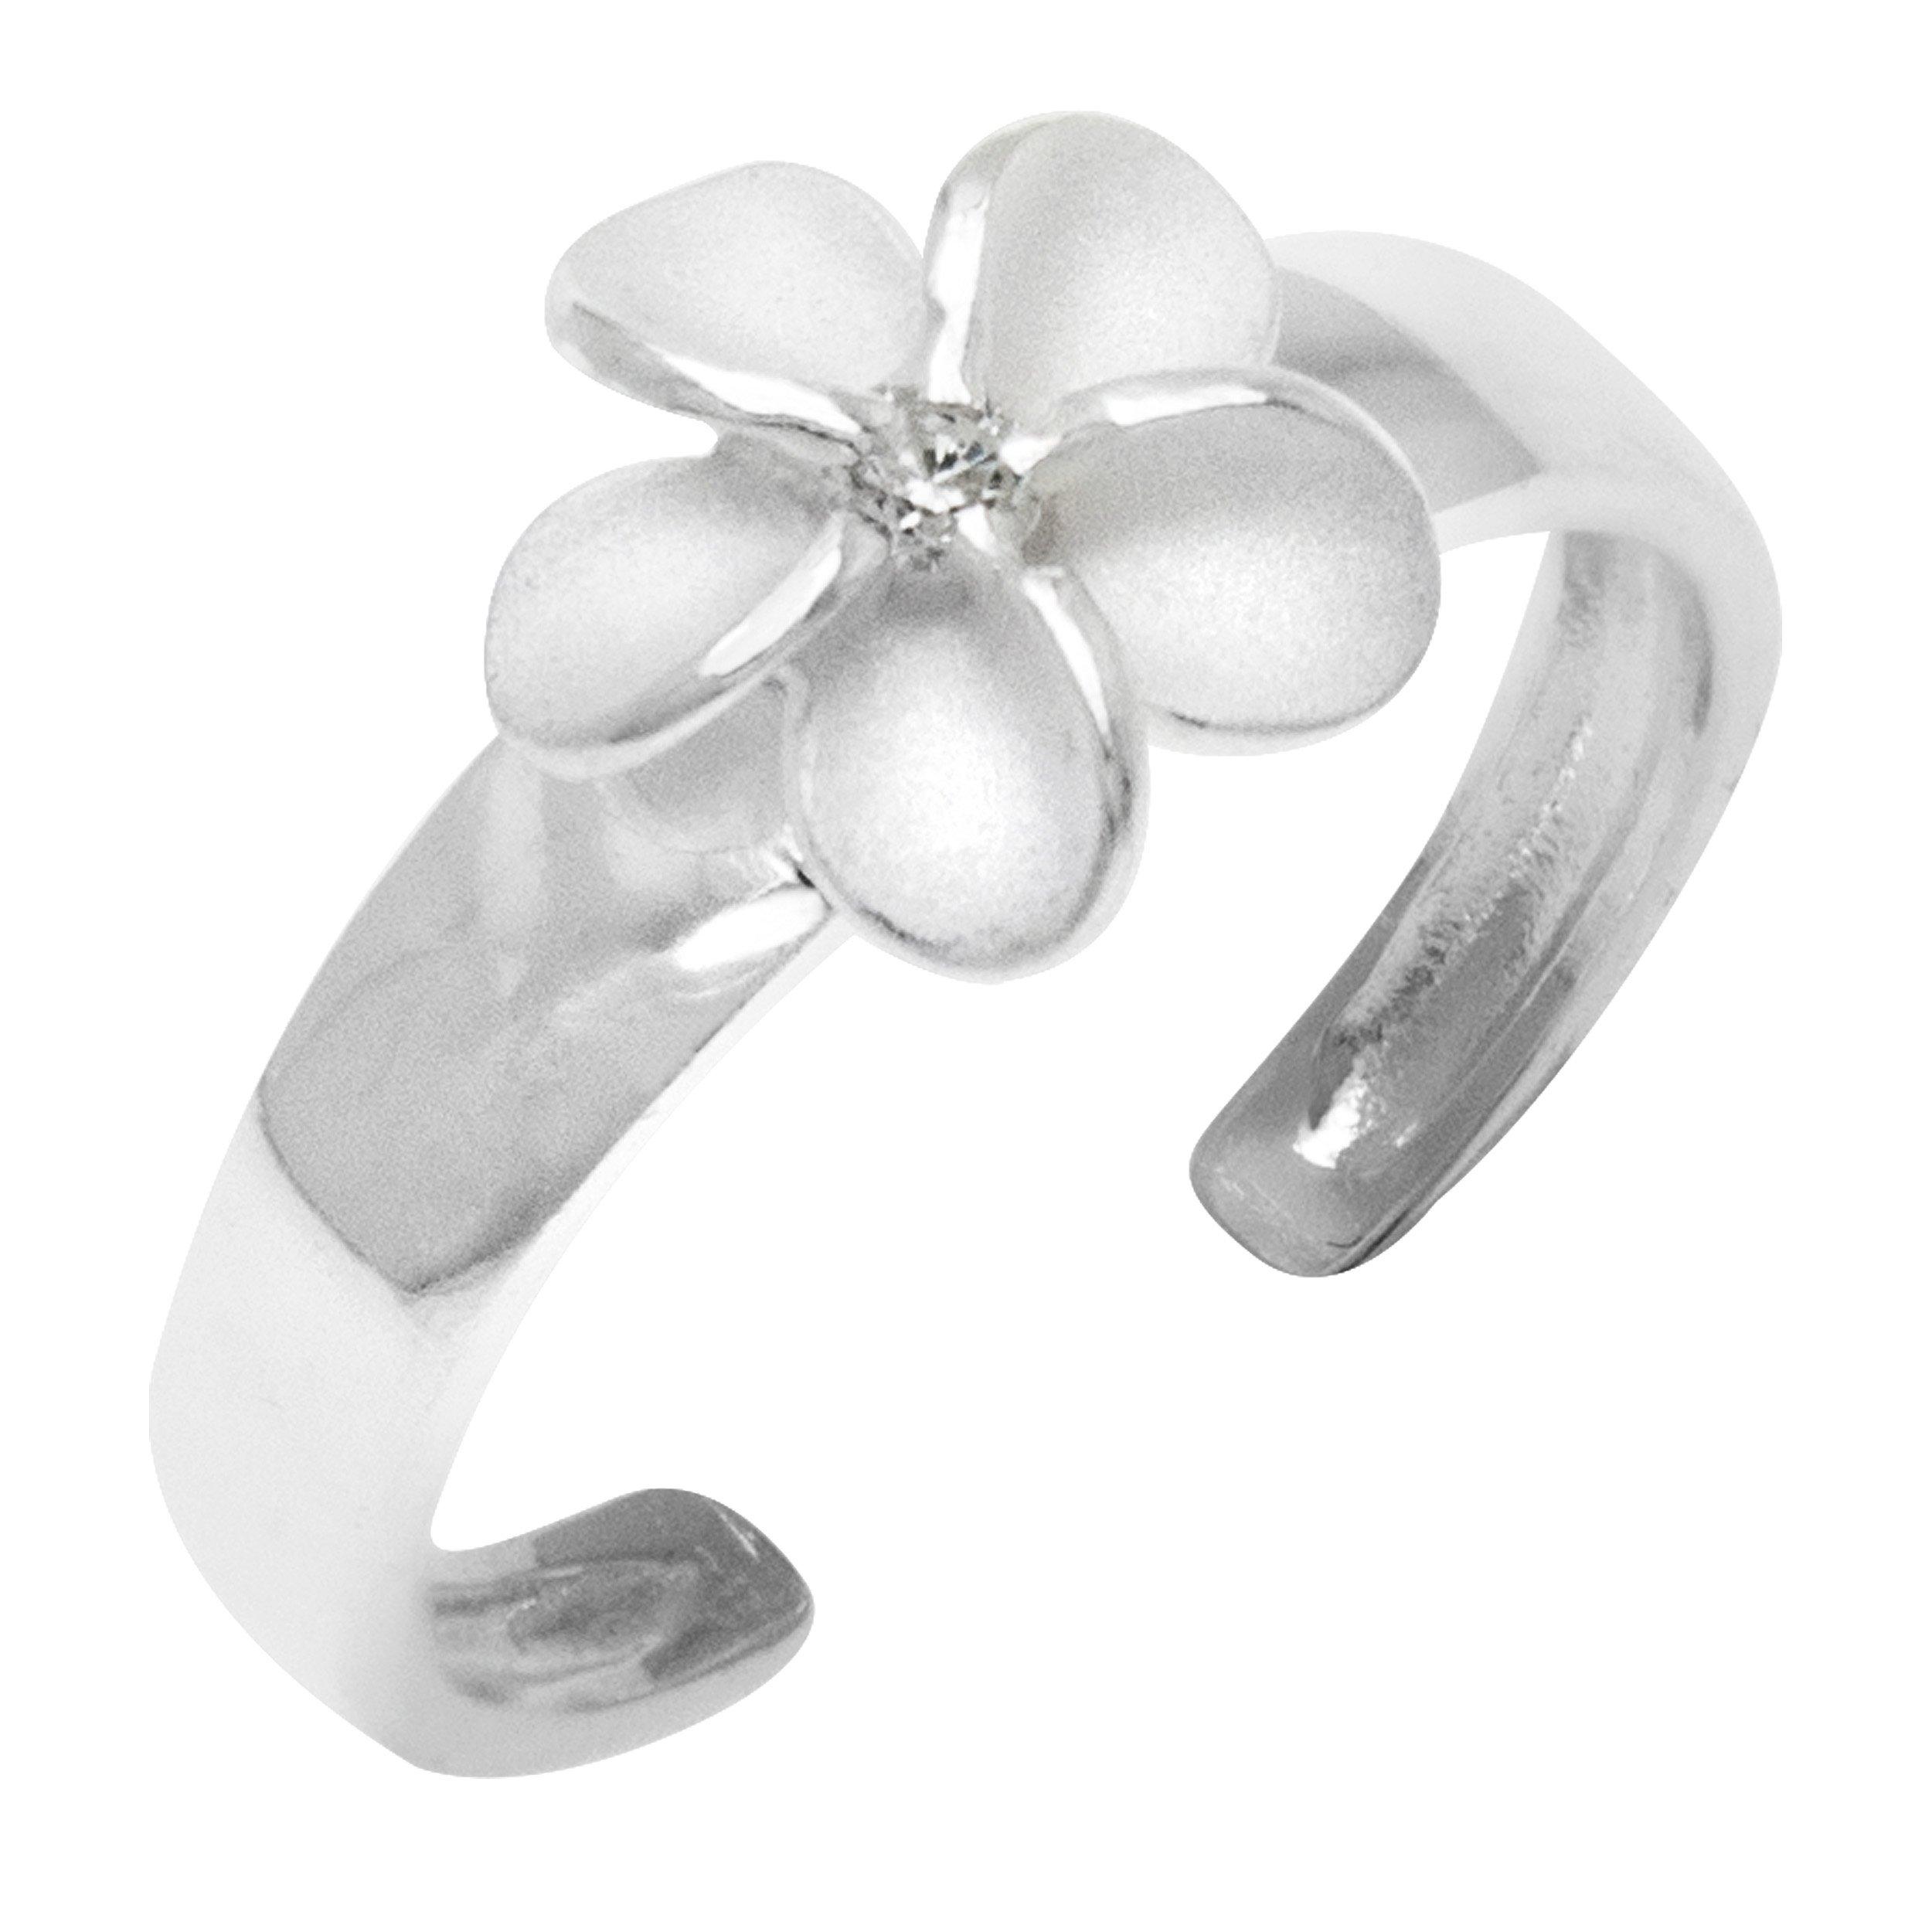 Honolulu Jewelry Company Sterling Silver Plumeria Flower CZ Toe Ring by Honolulu Jewelry Company